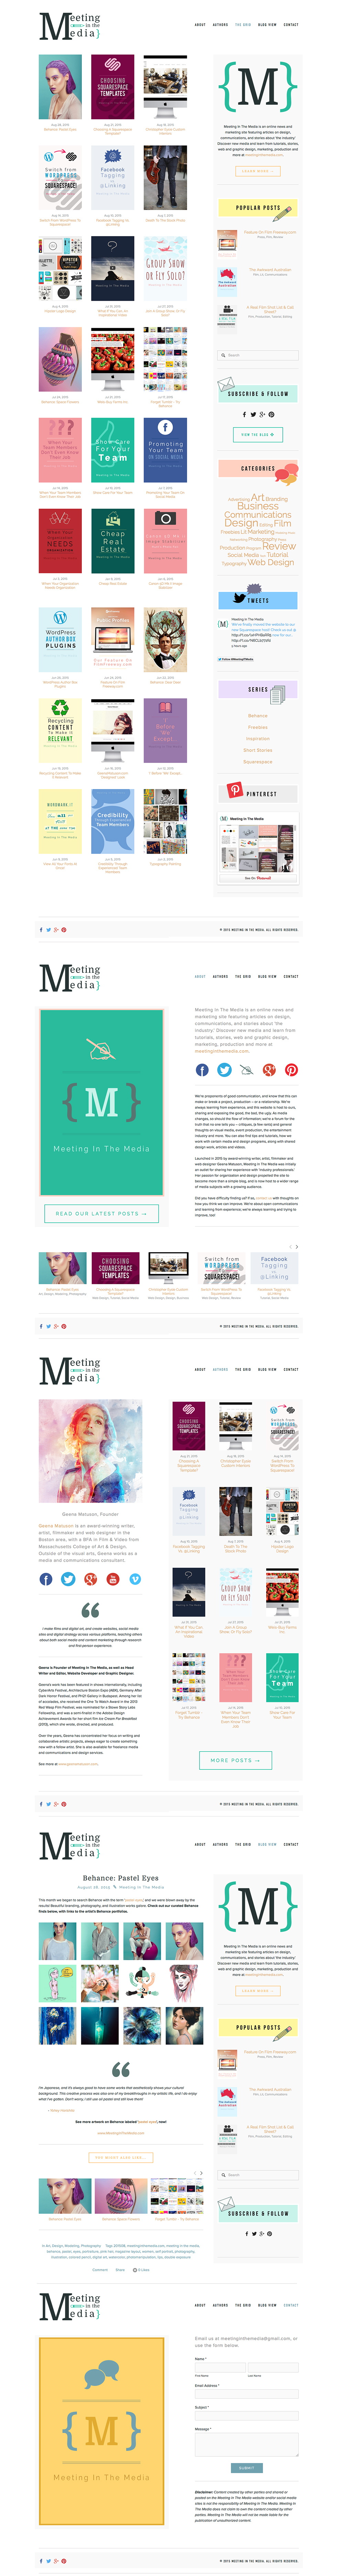 MeetingInTheMedia_Website_Narrow_Flat_Cropped_Small.jpg